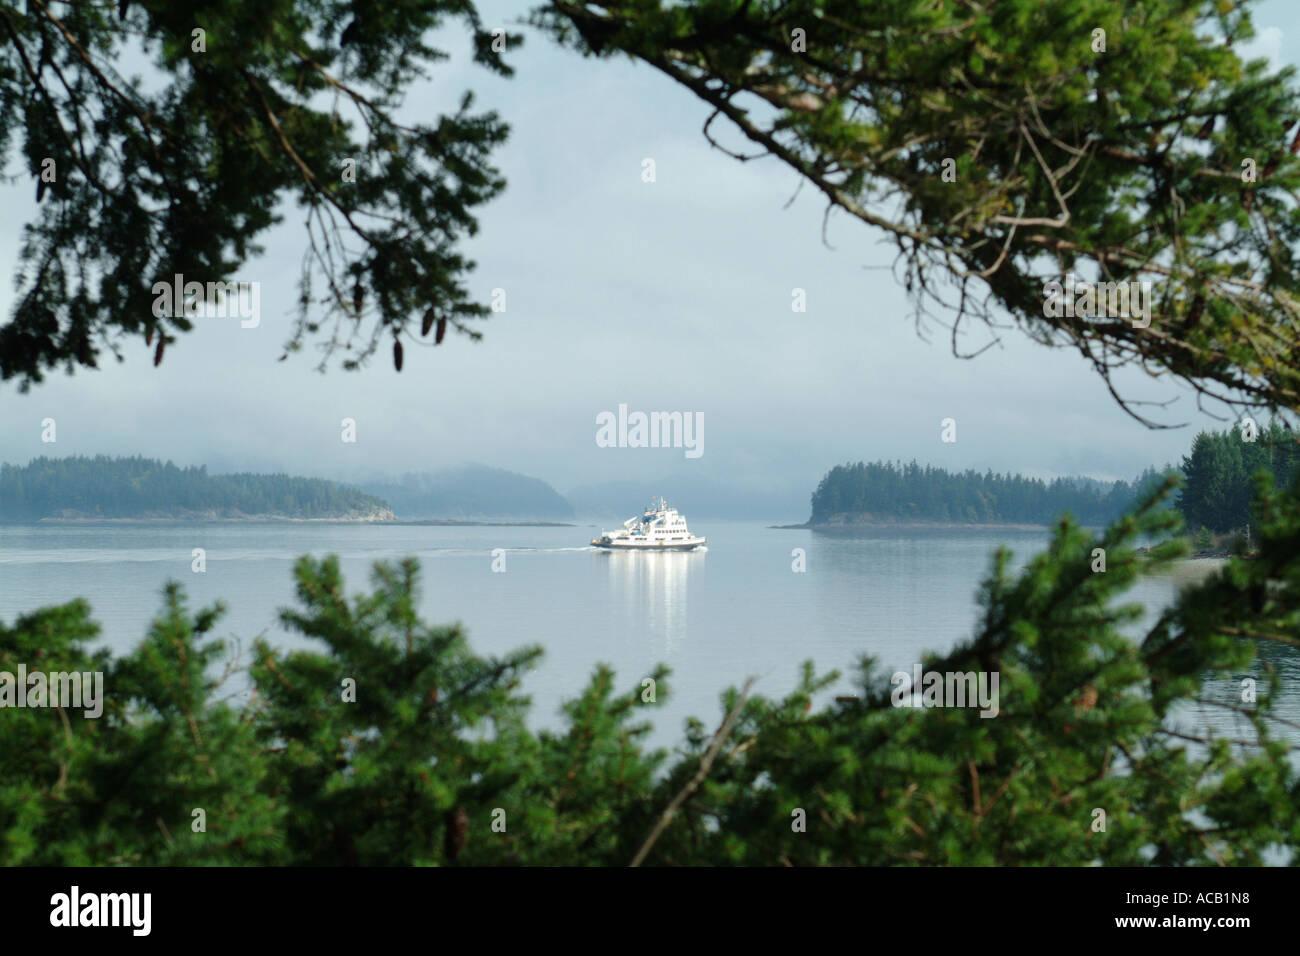 Heriot Bay ferry looking towards Desolation Sound Quadra Island British Columbia BC Canada - Stock Image